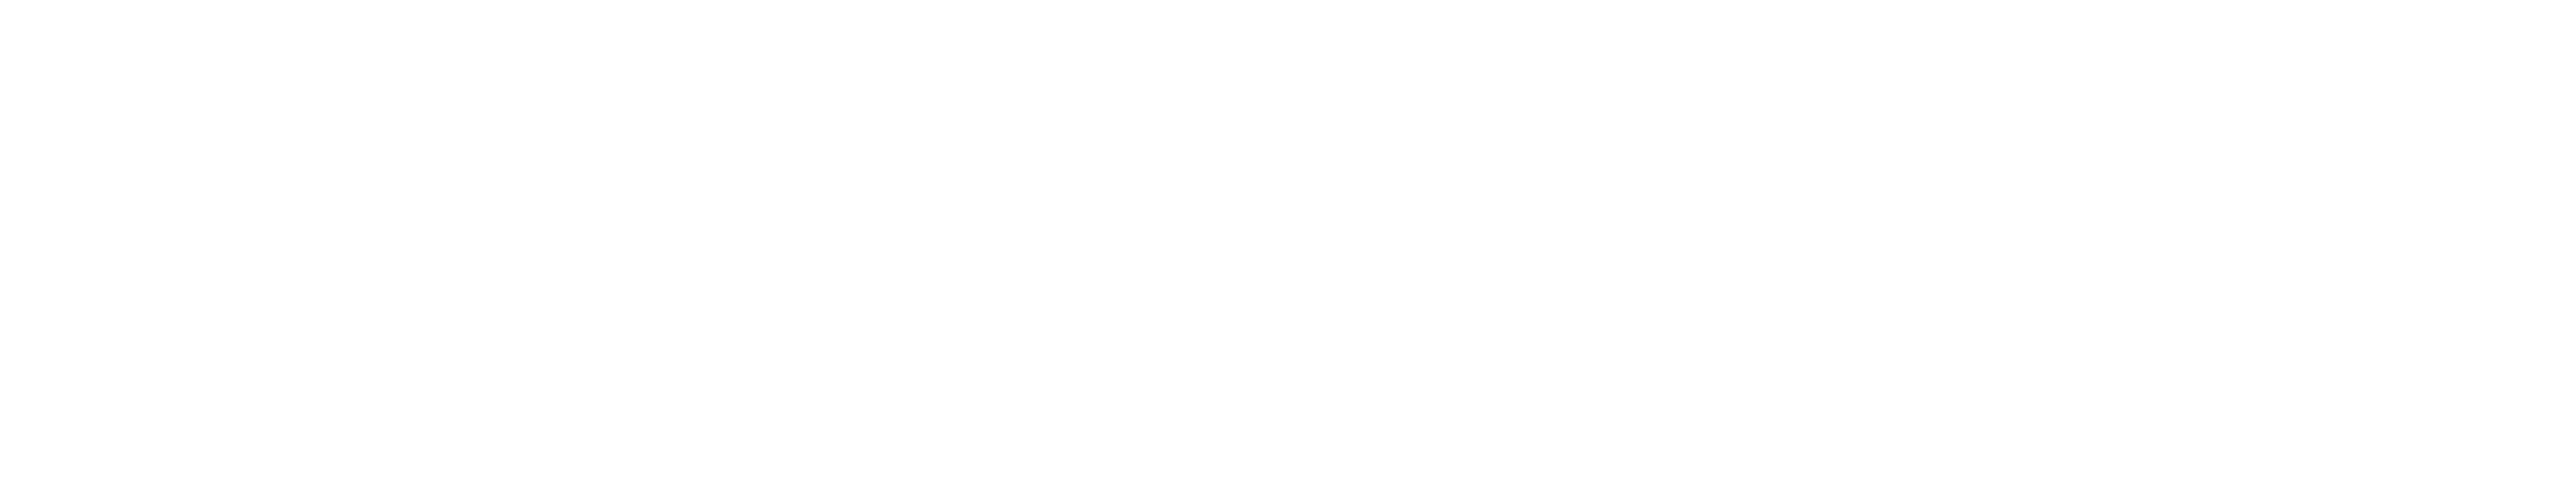 STOP dražbám!